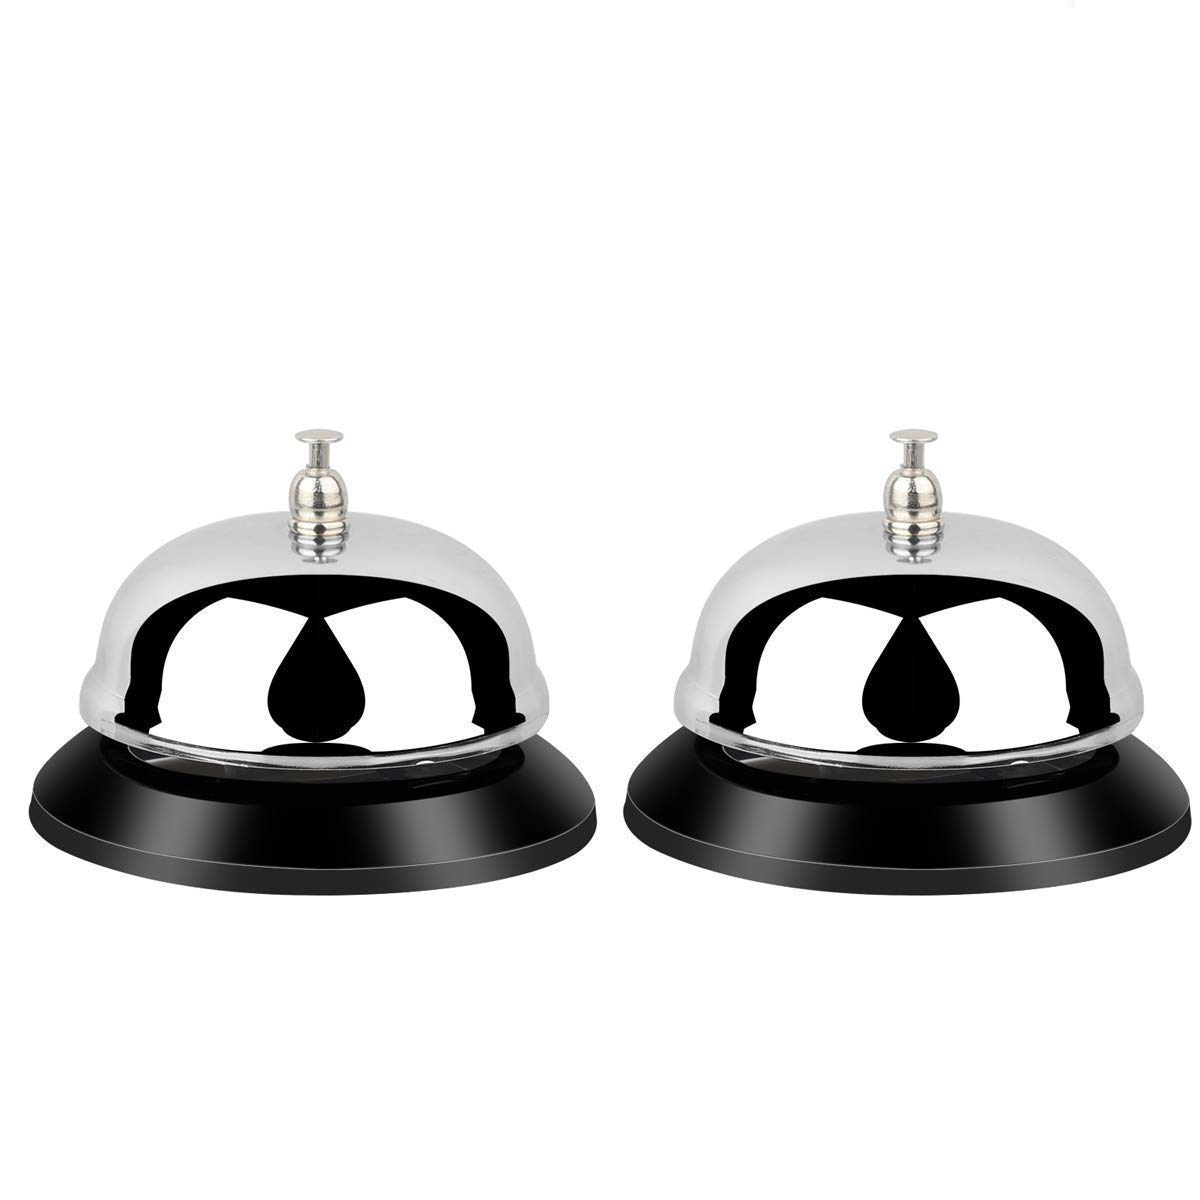 2 Pack Desk Service Bells, YYPLUS Desk Big Call Bell for Hotels, Schools, Restaurants, Hospitals, Chrome Finish, All-Metal Construction (3.3 inch)